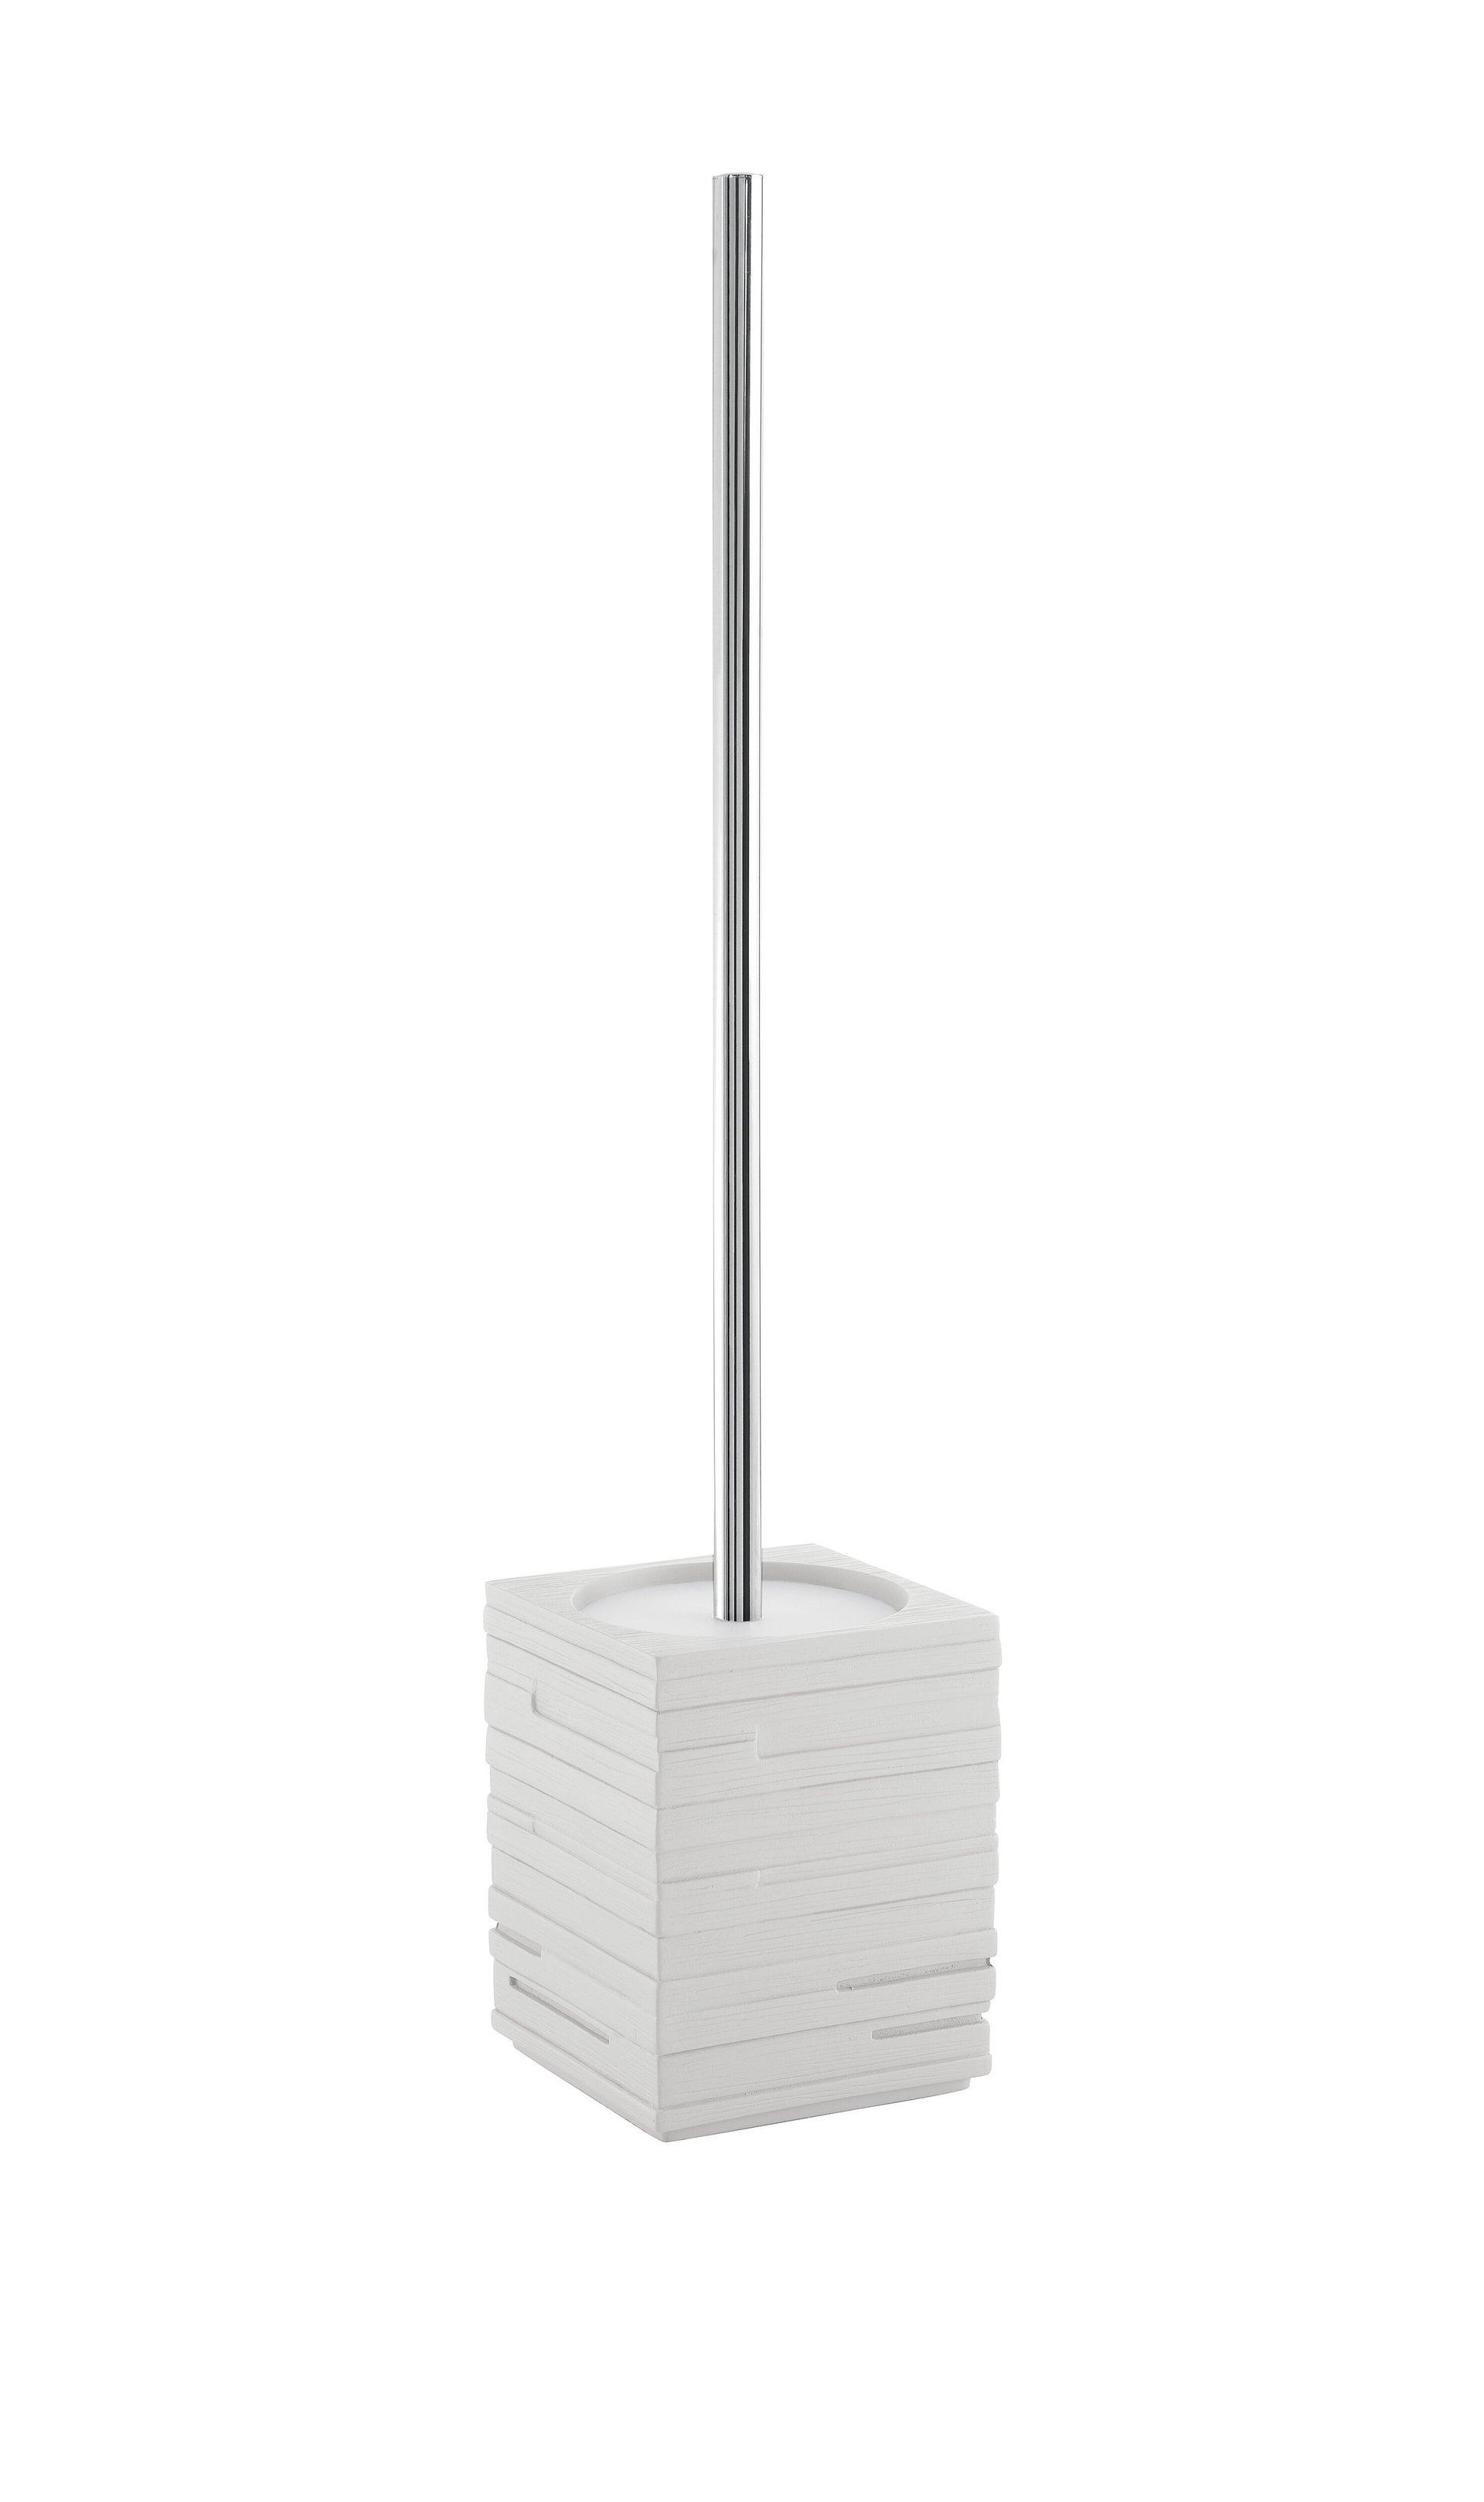 Pavimento PVC adesivo Limestone Sp 2 mm grigio / argento - 4